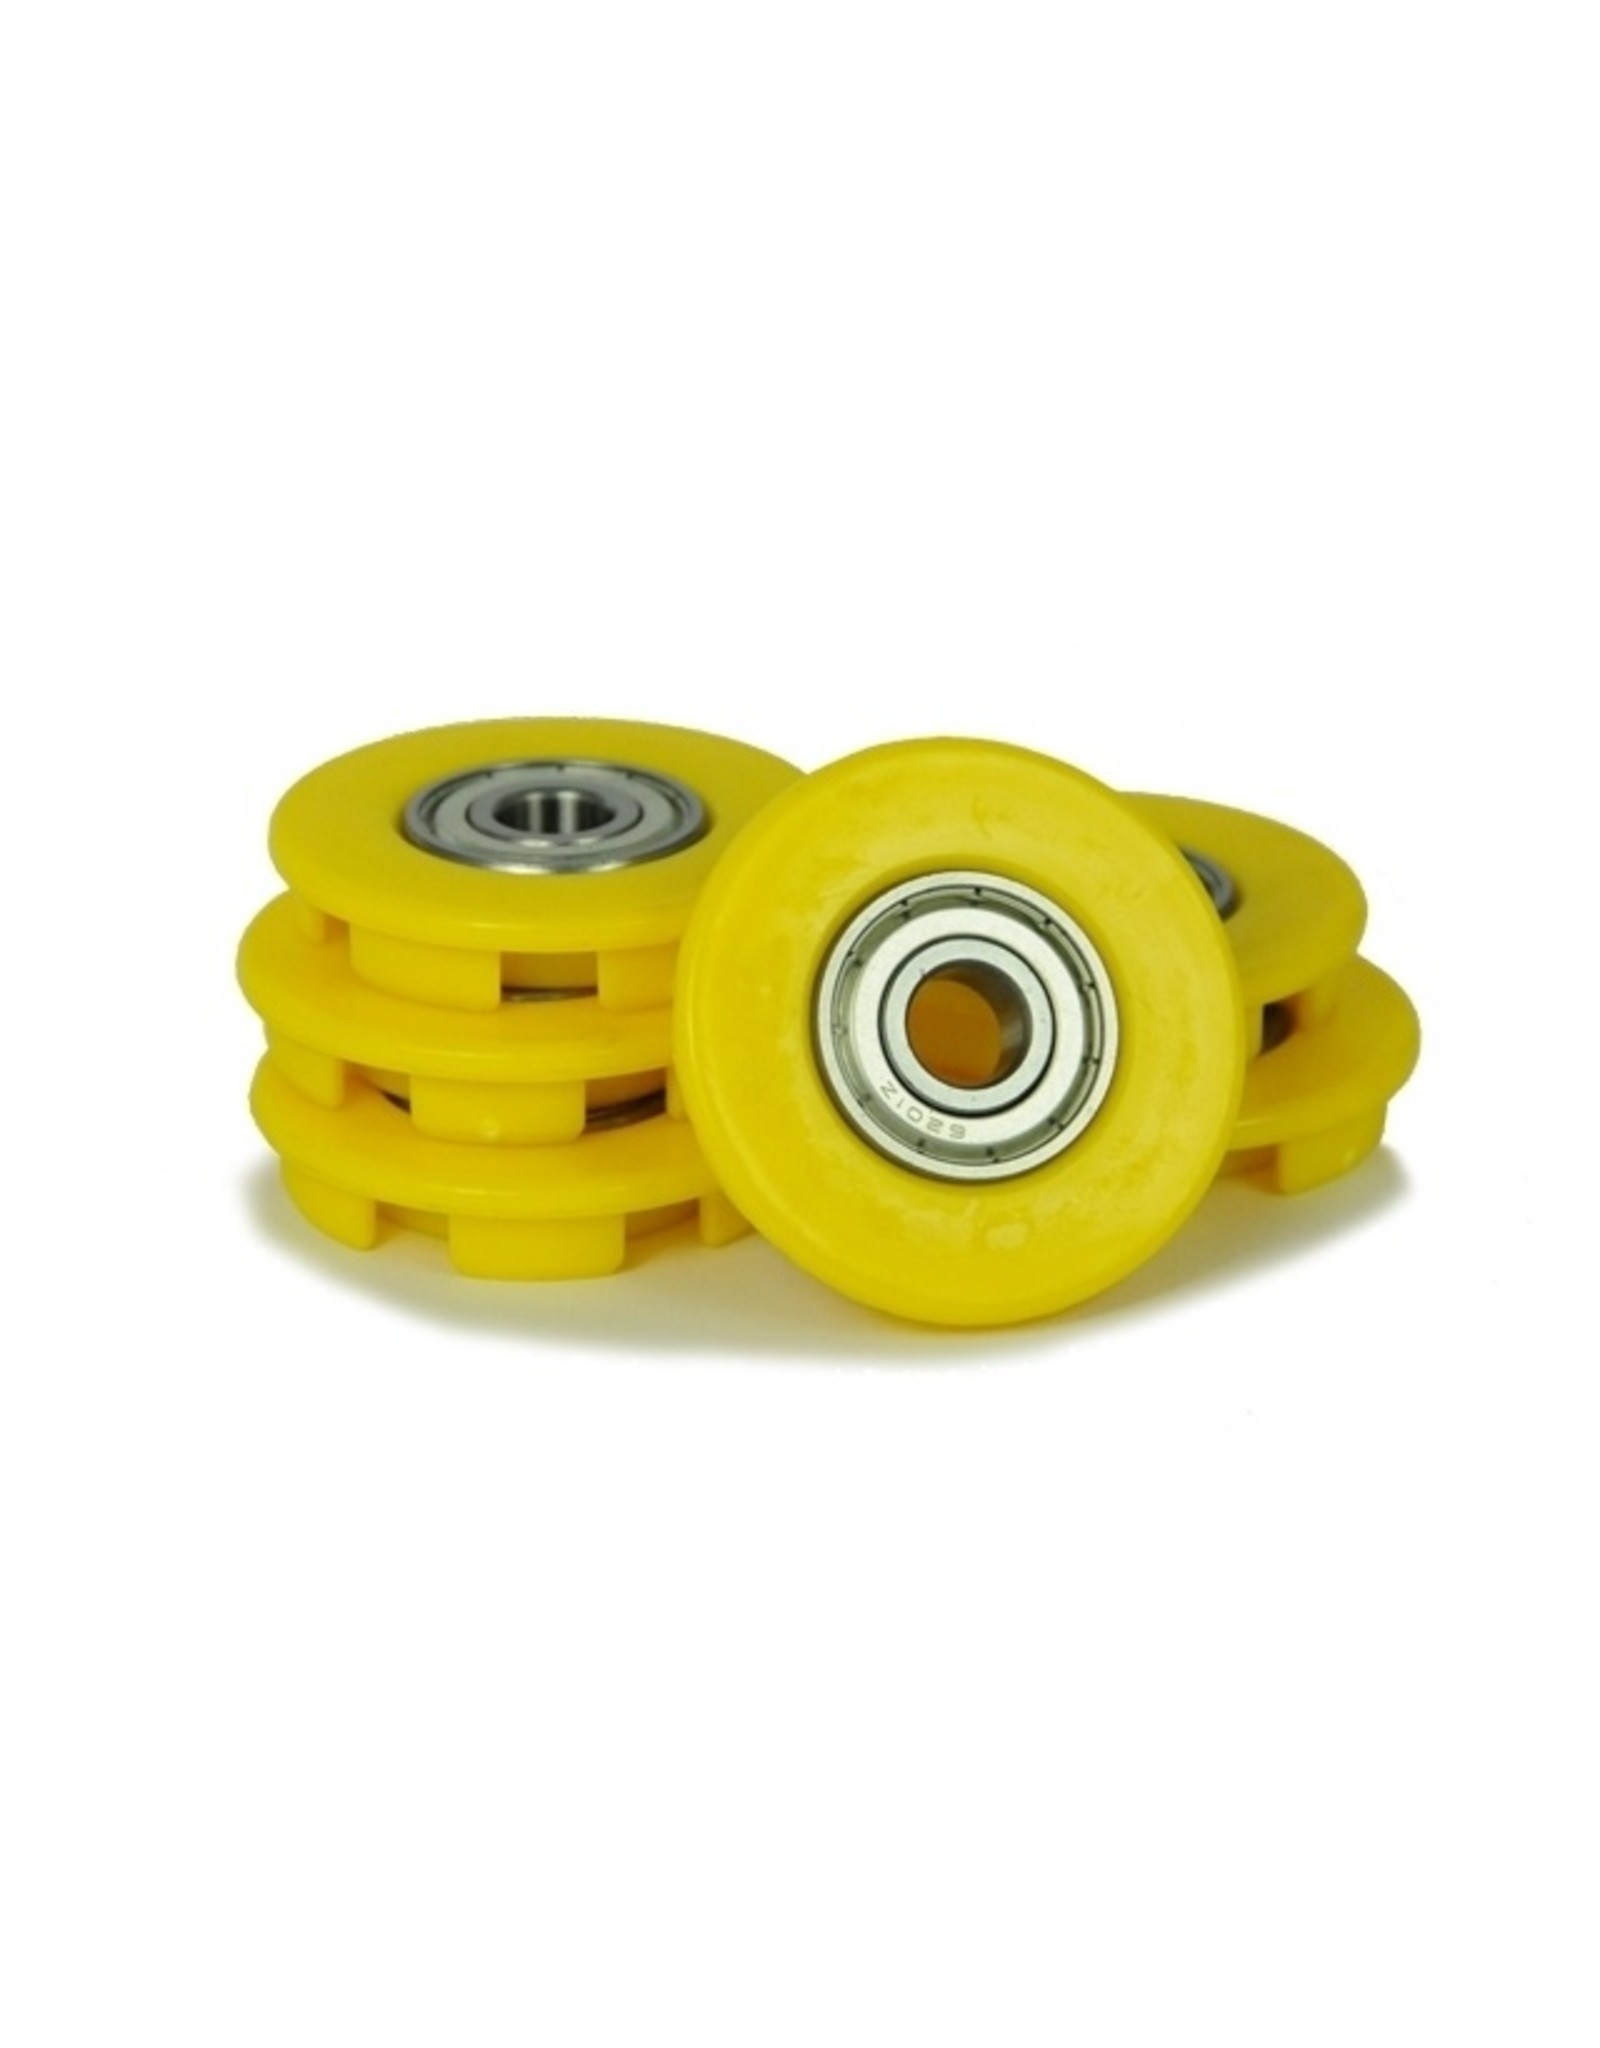 BERG BERG Buddy Radkappe 12mm gelb